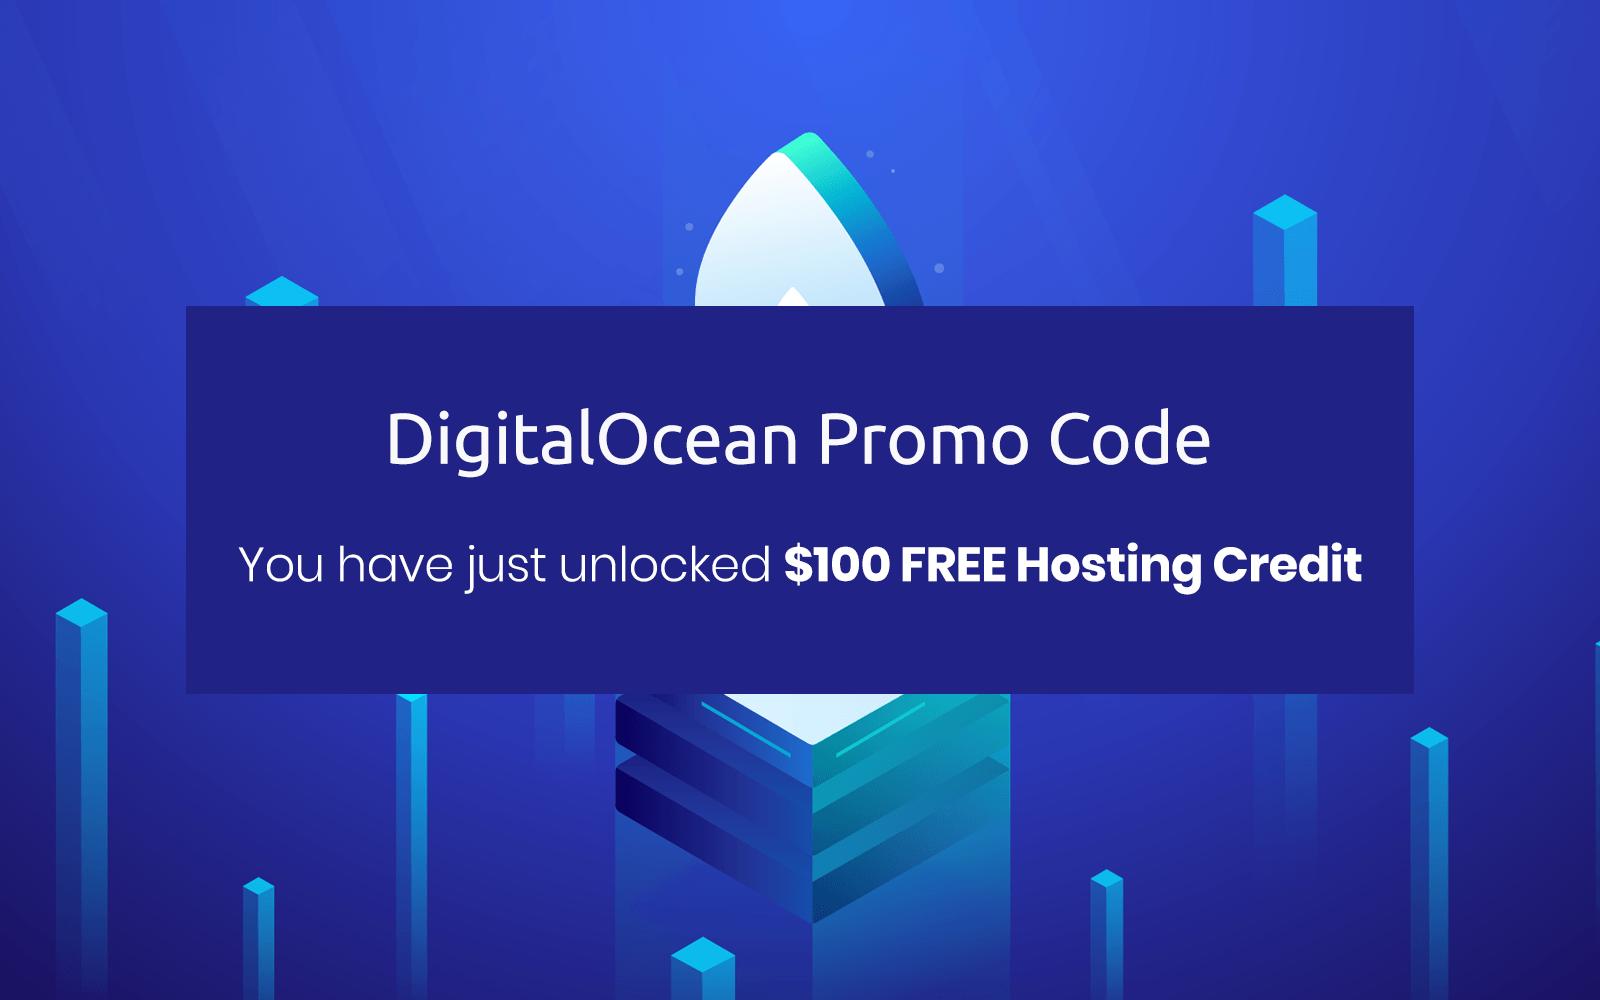 Digitalocean Promo Code 2021 Get 100 Free Hosting Credit Verified